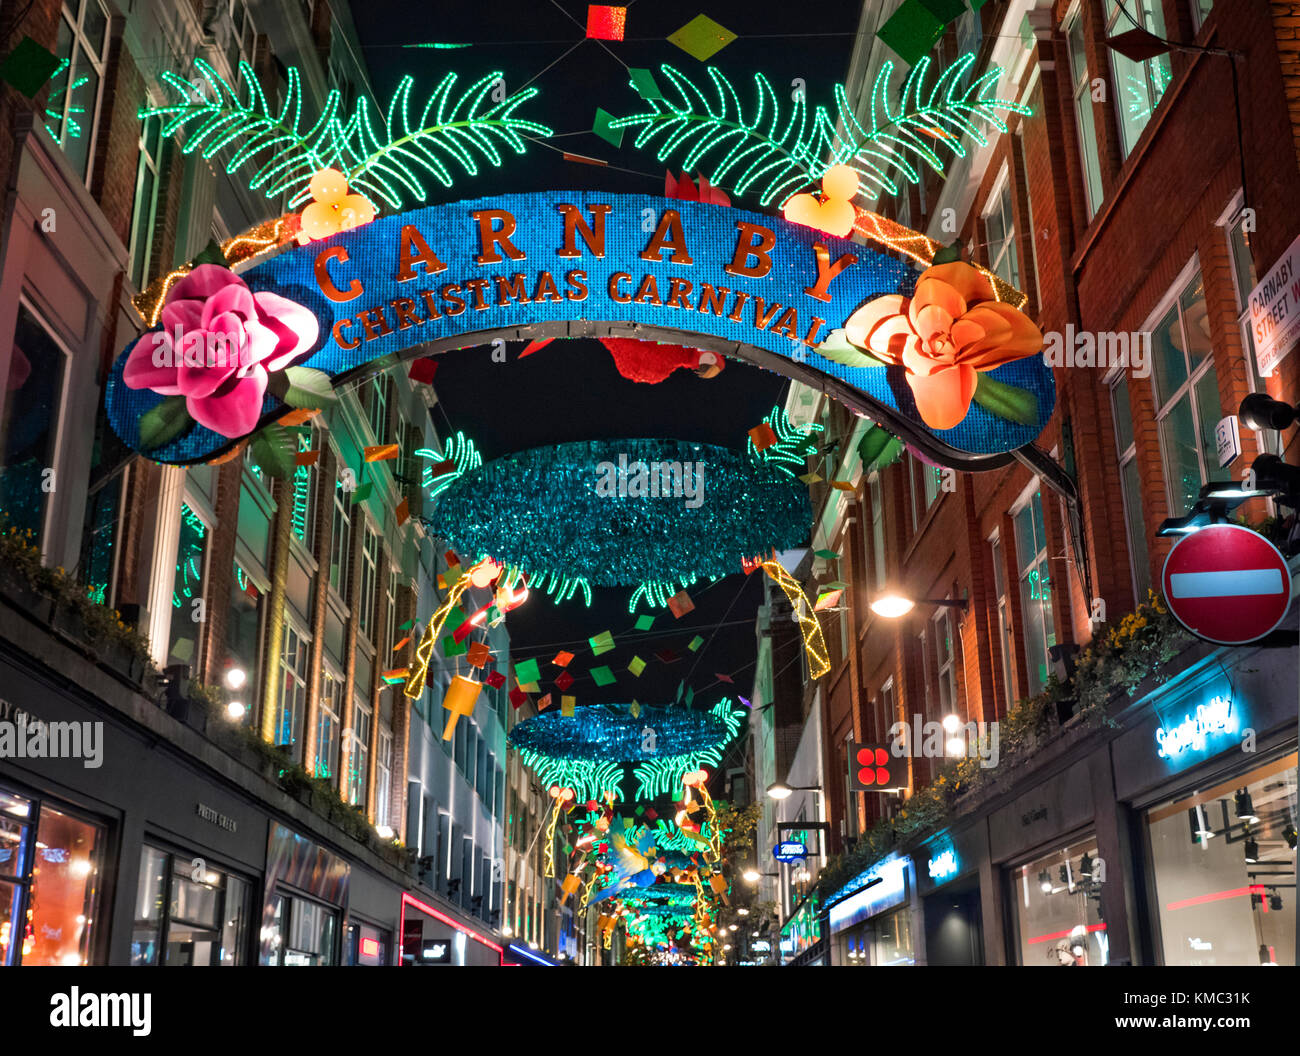 Carnaby Street Christmas Lights 2017 - Stock Image